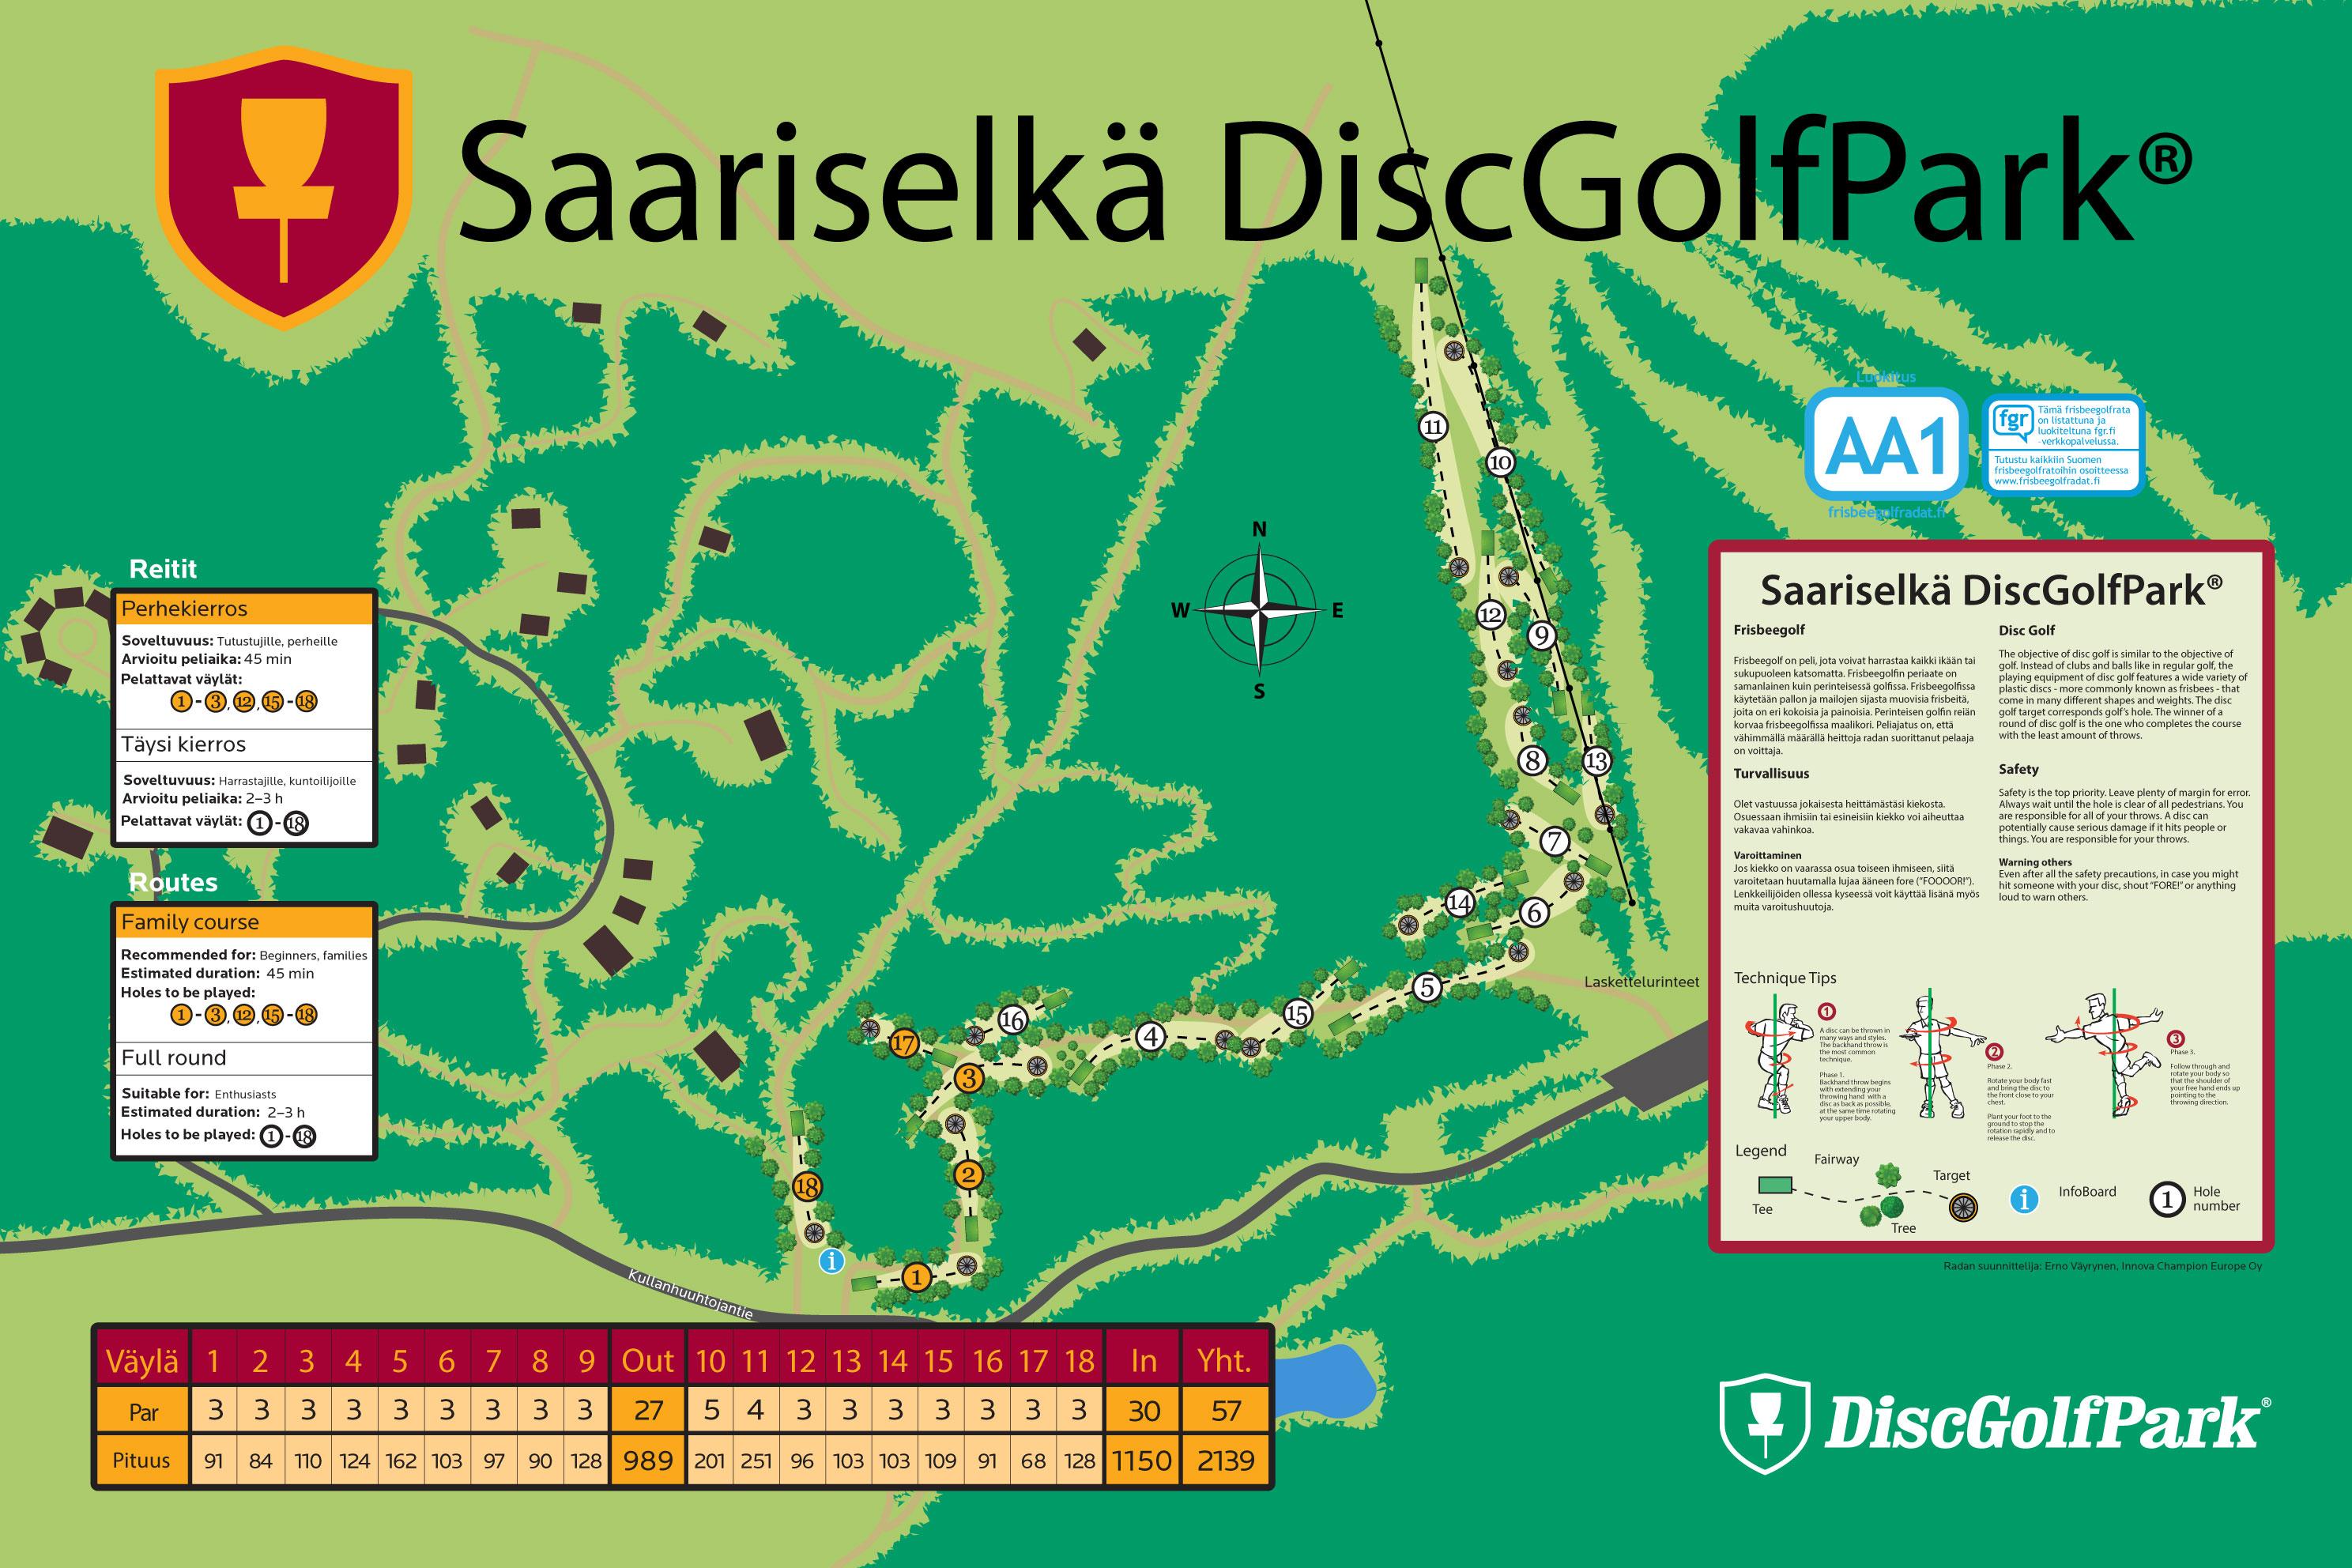 Saariselka Discgolfpark Discgolfpark